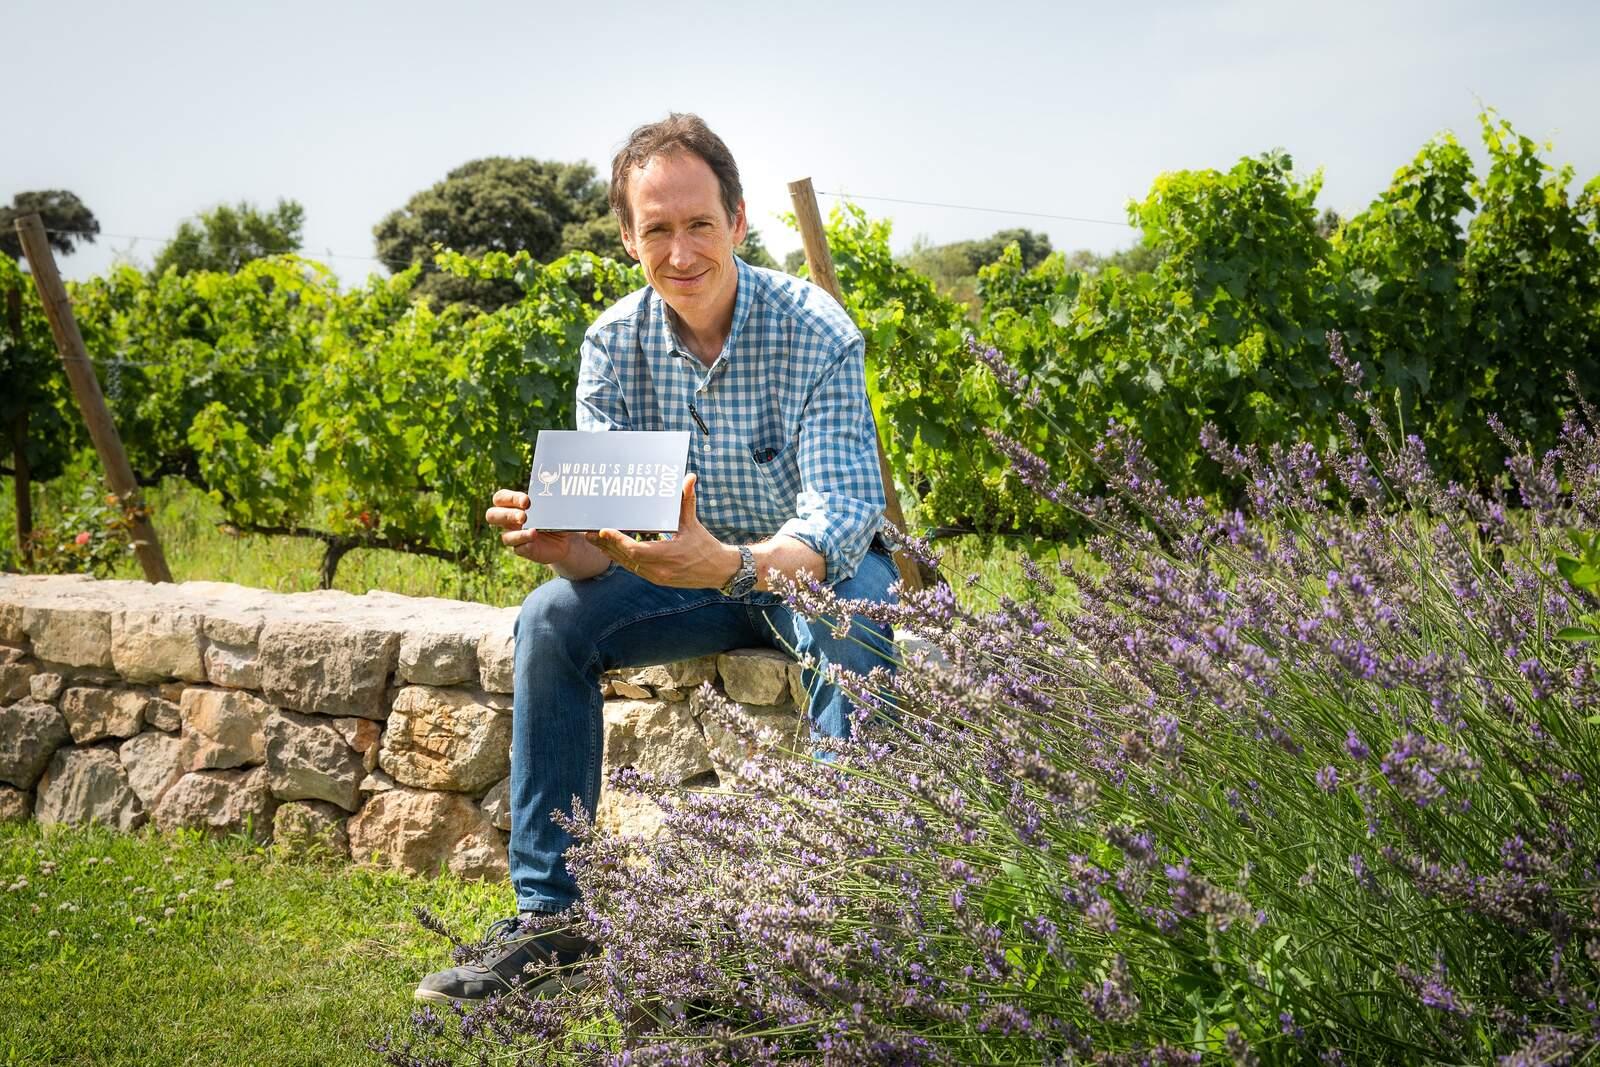 Miquel Torres amb el reconeixement de World's Best Vineyars